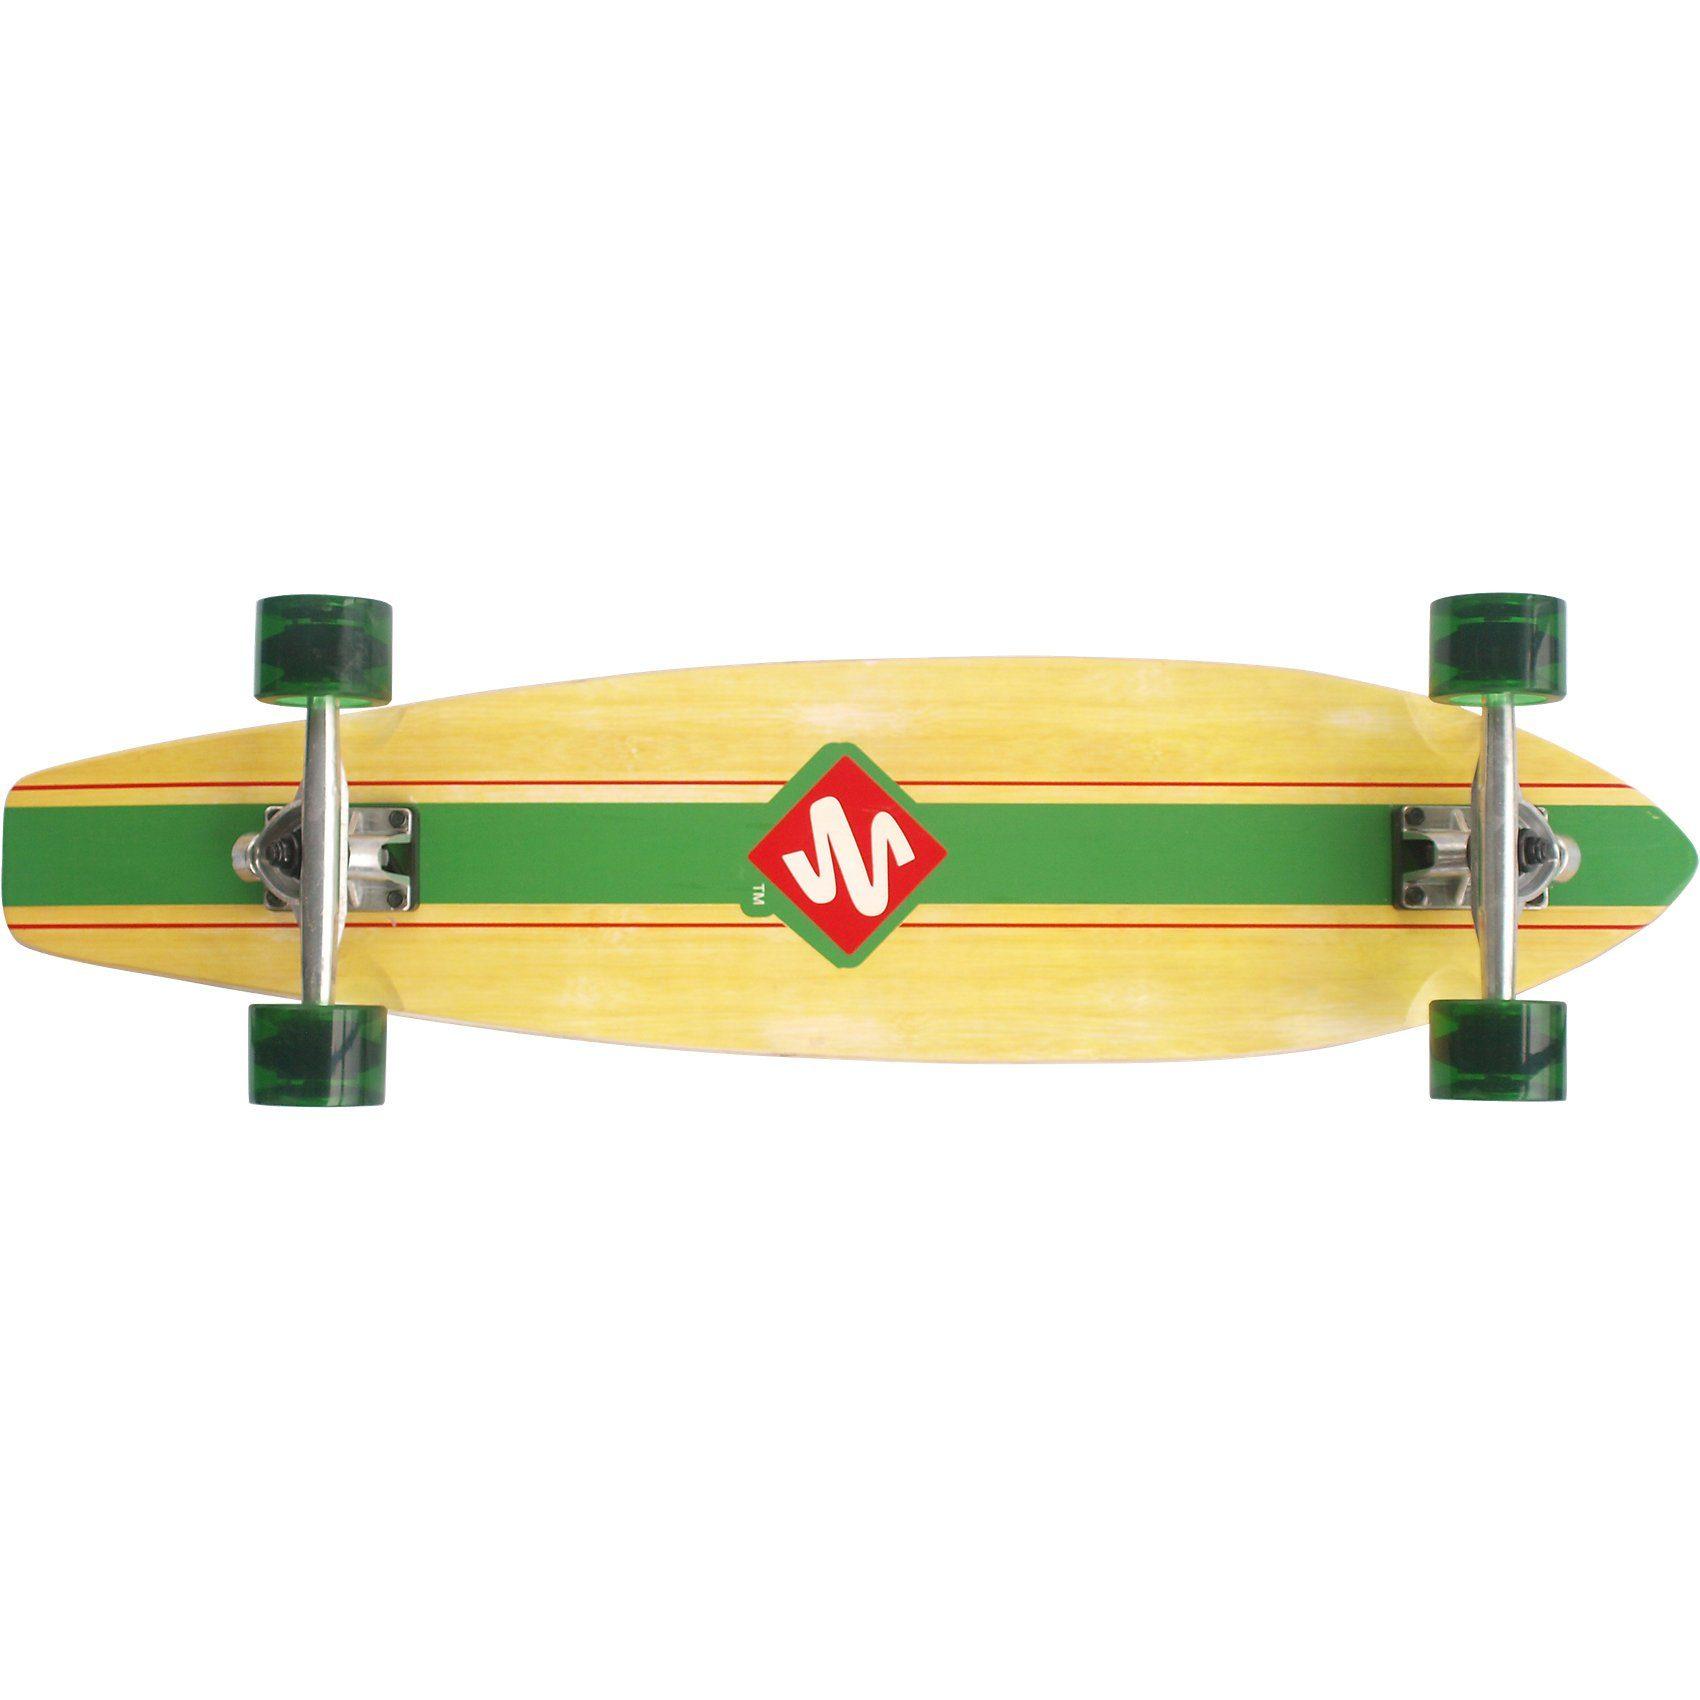 "Streetsurfing Longboard Kicktail 36"" - Infinity, grün"